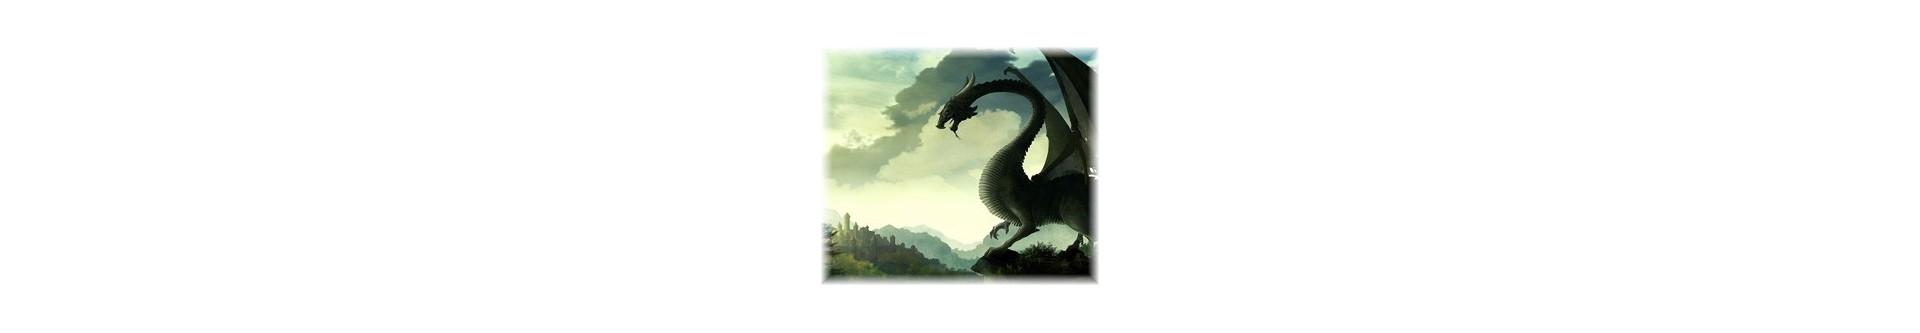 Bandes dessinées d'occasion | BD Heroic fantasy